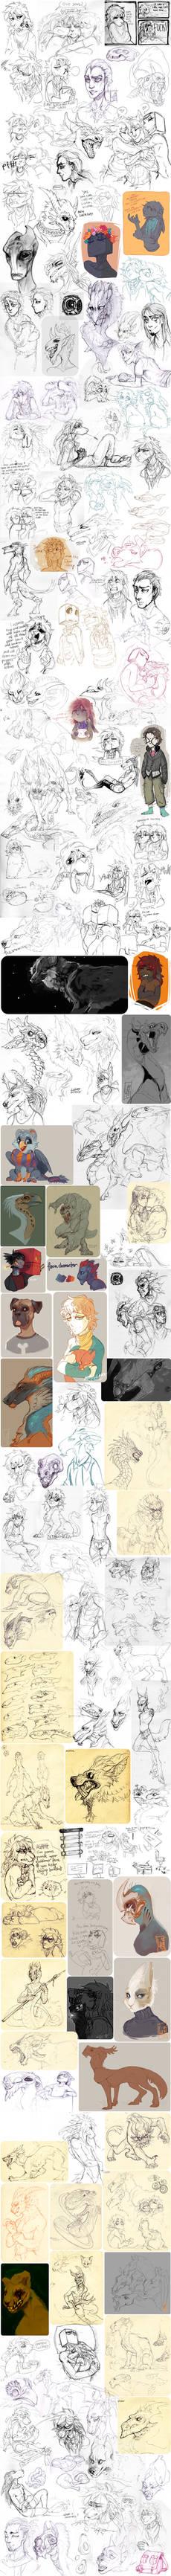 Sketch dump 59